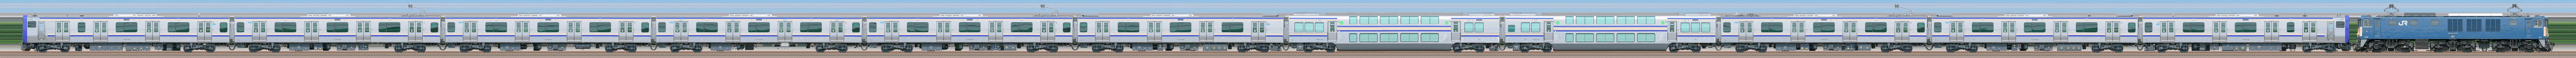 JR東日本 横須賀線・総武快速線 E235系1000番台F-01編成配給輸送(山側)の編成サイドビュー